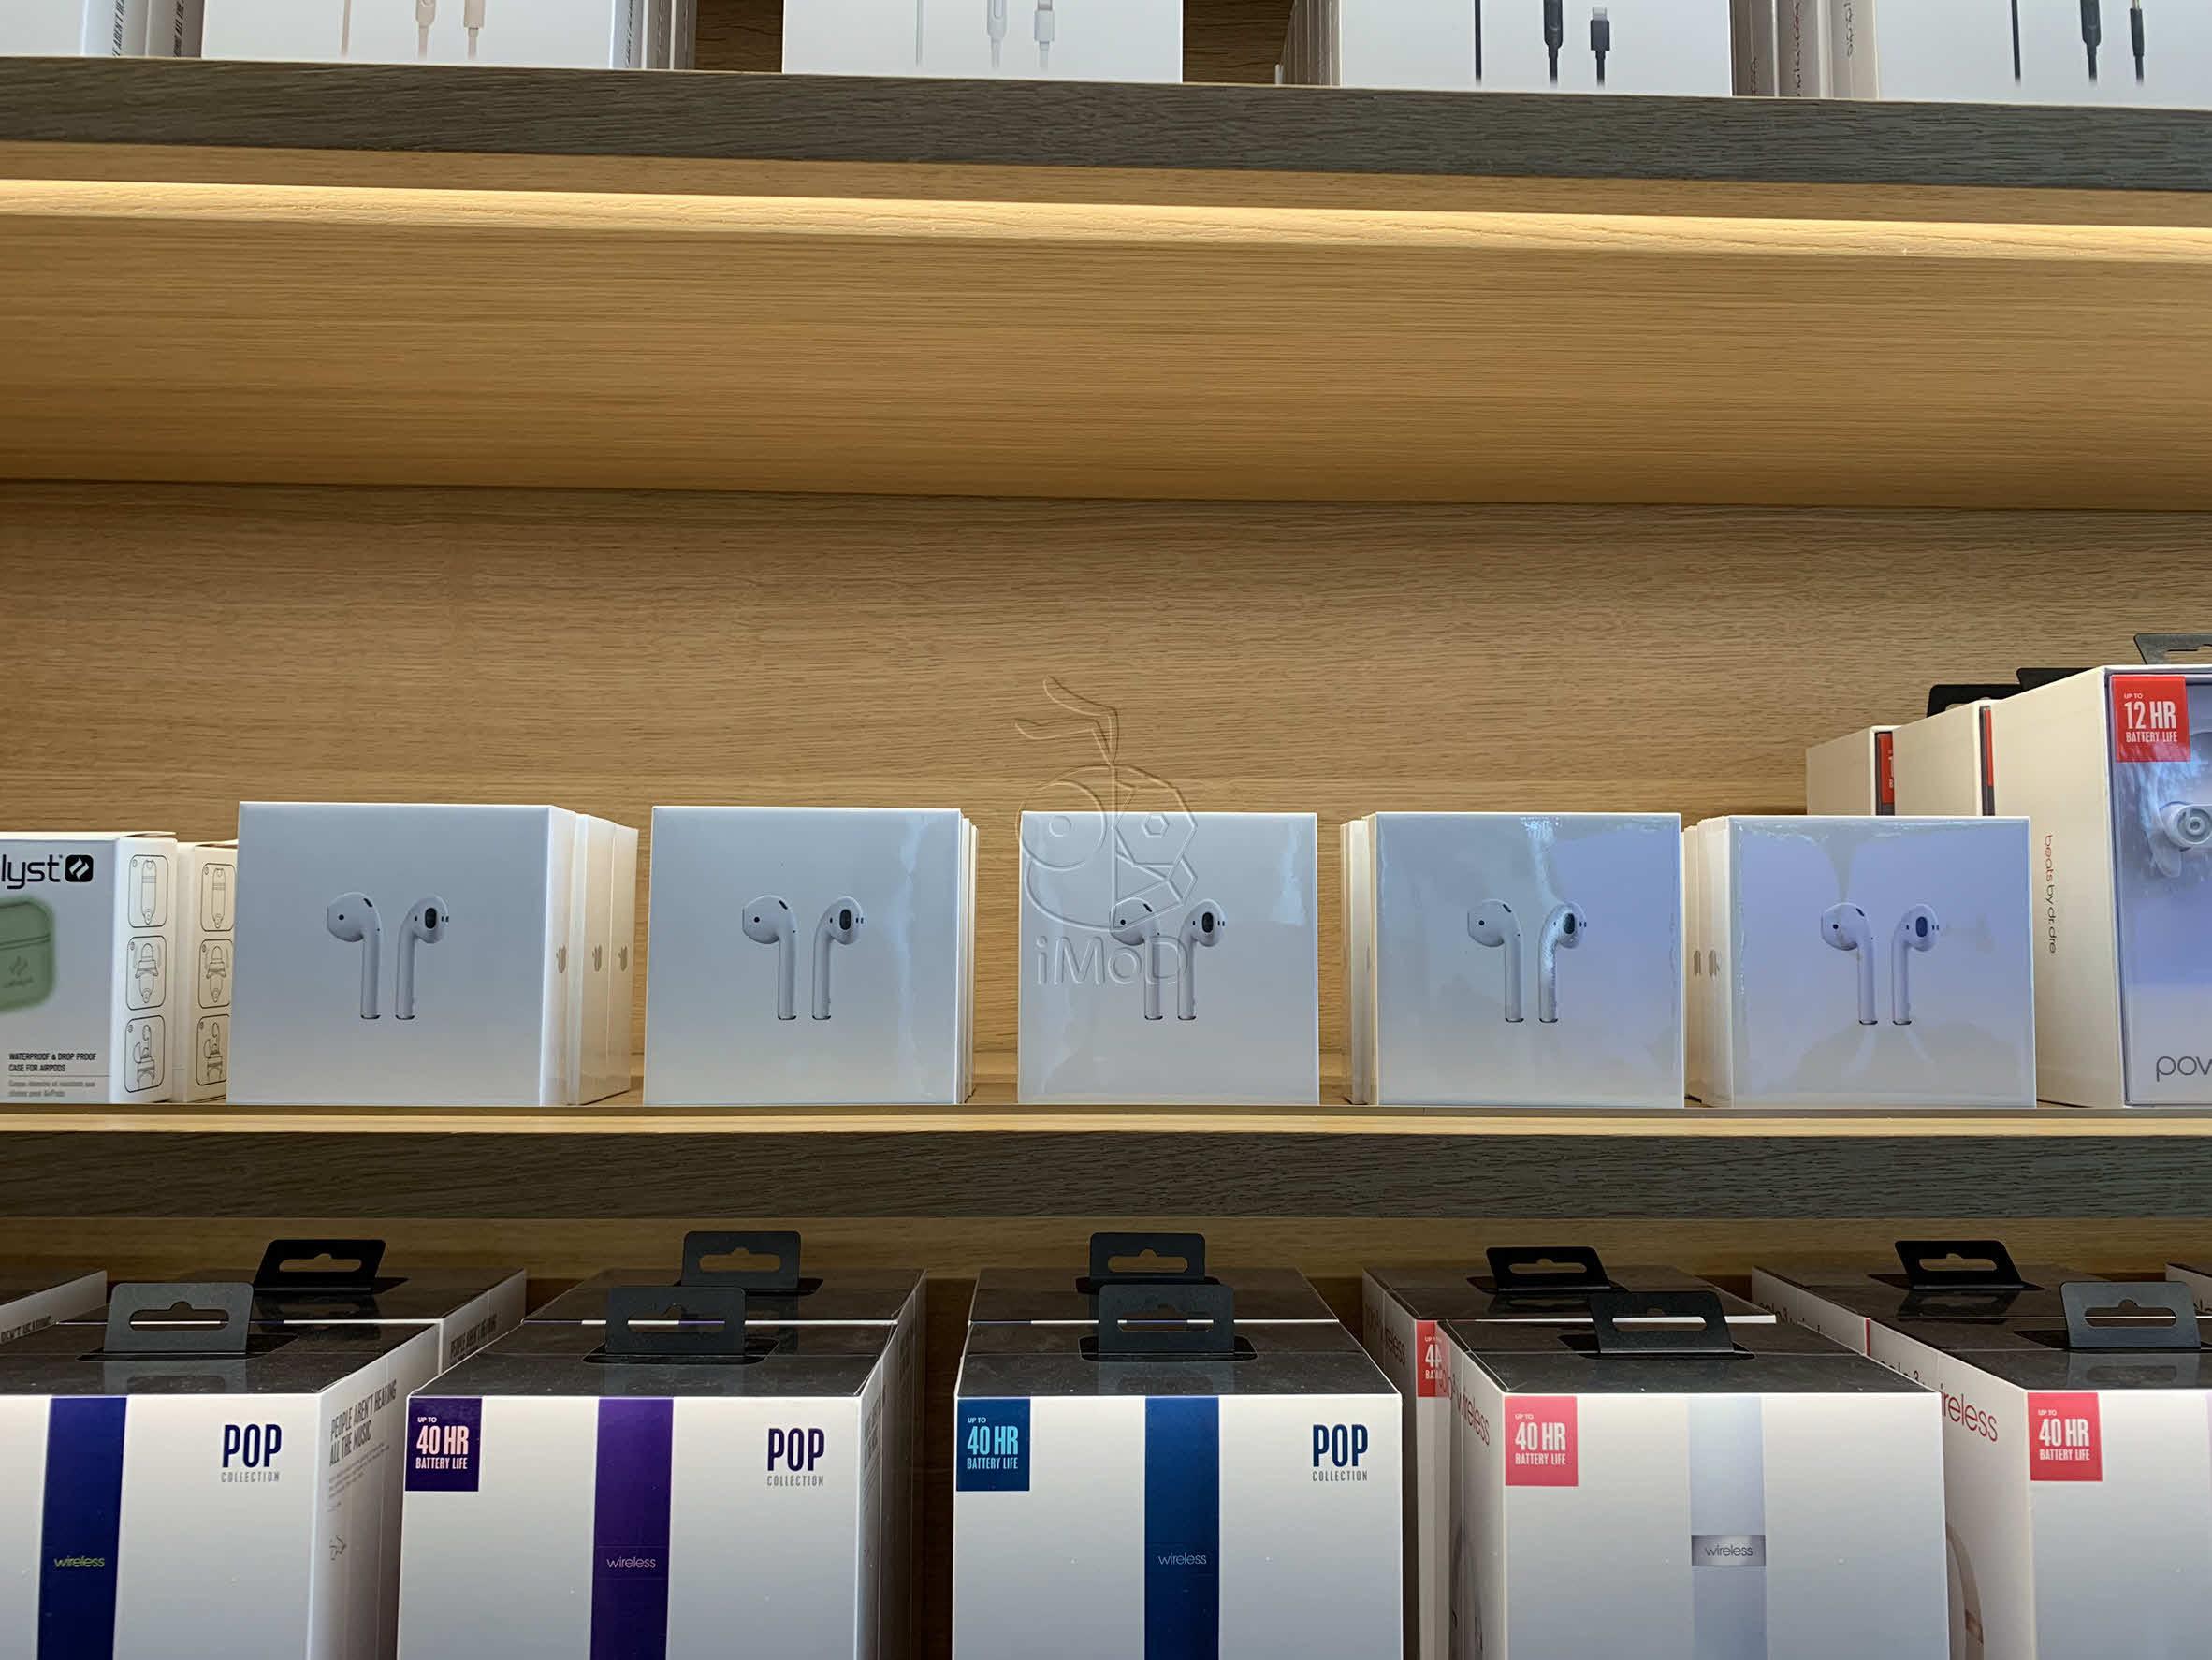 Ipad Mini Gen 5 Ipad Air Gen 3 Airpods 2 Avaliable Apple Iconsiam Img 5